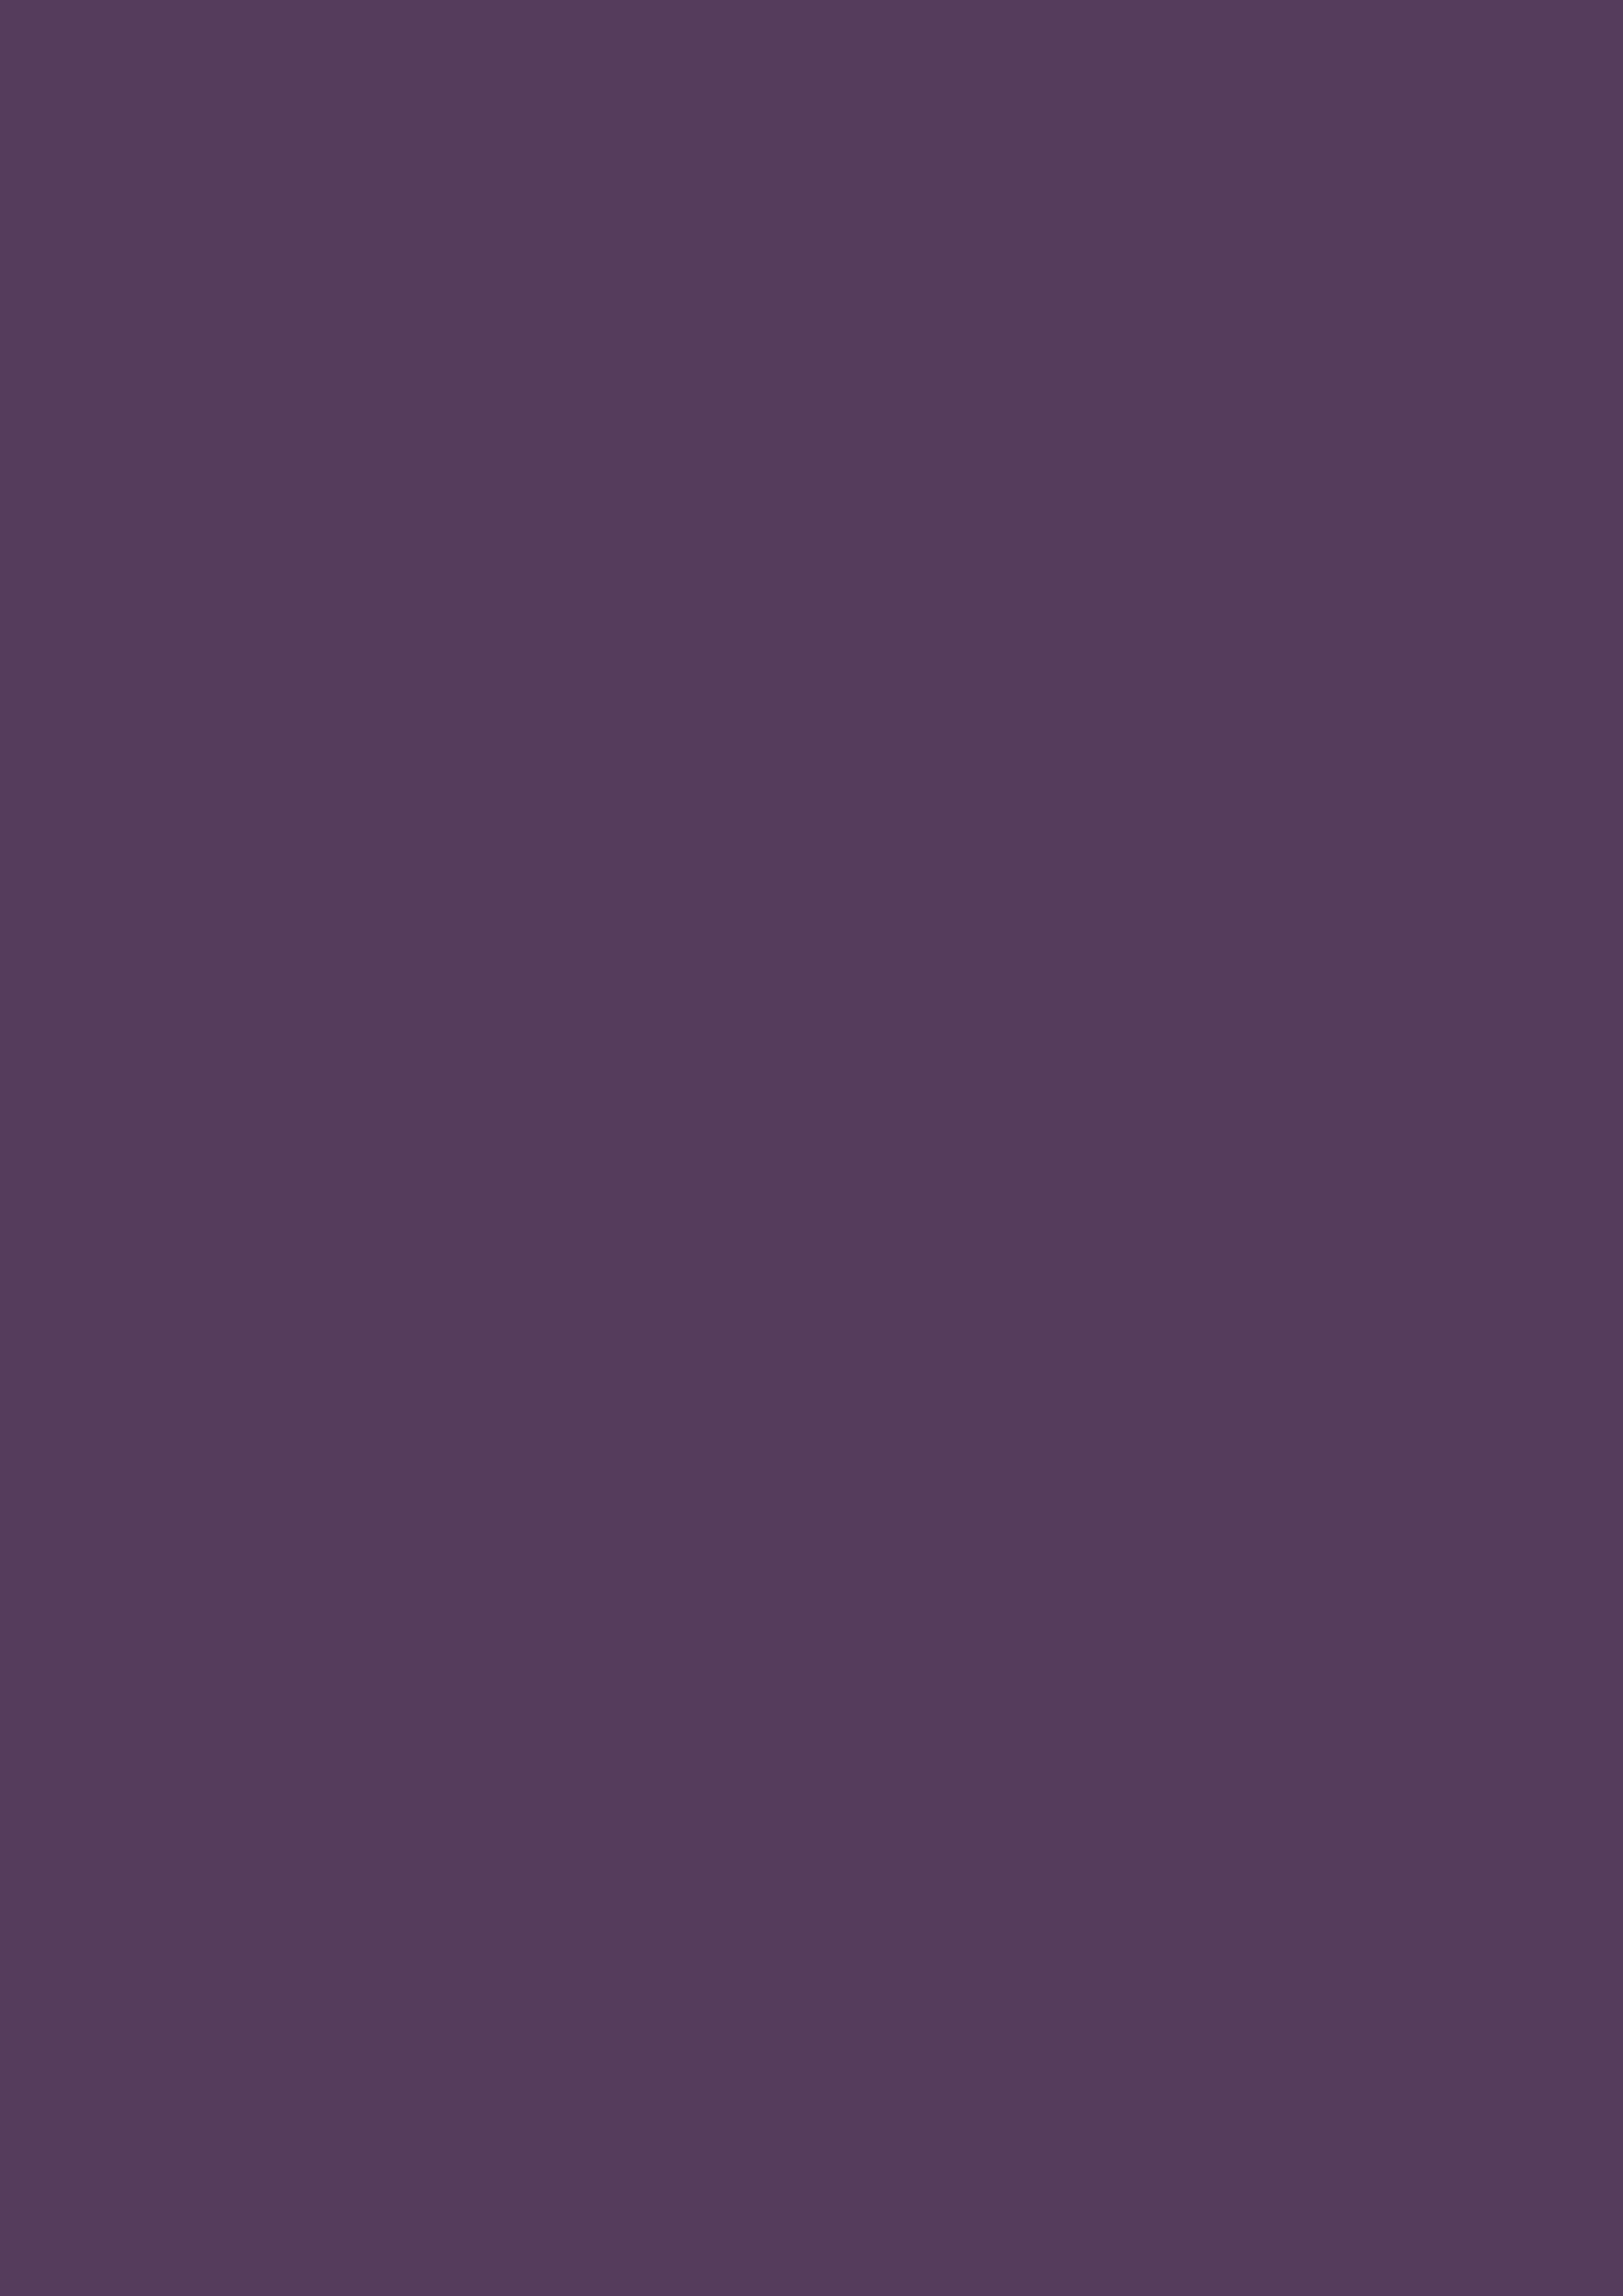 2480x3508 English Violet Solid Color Background